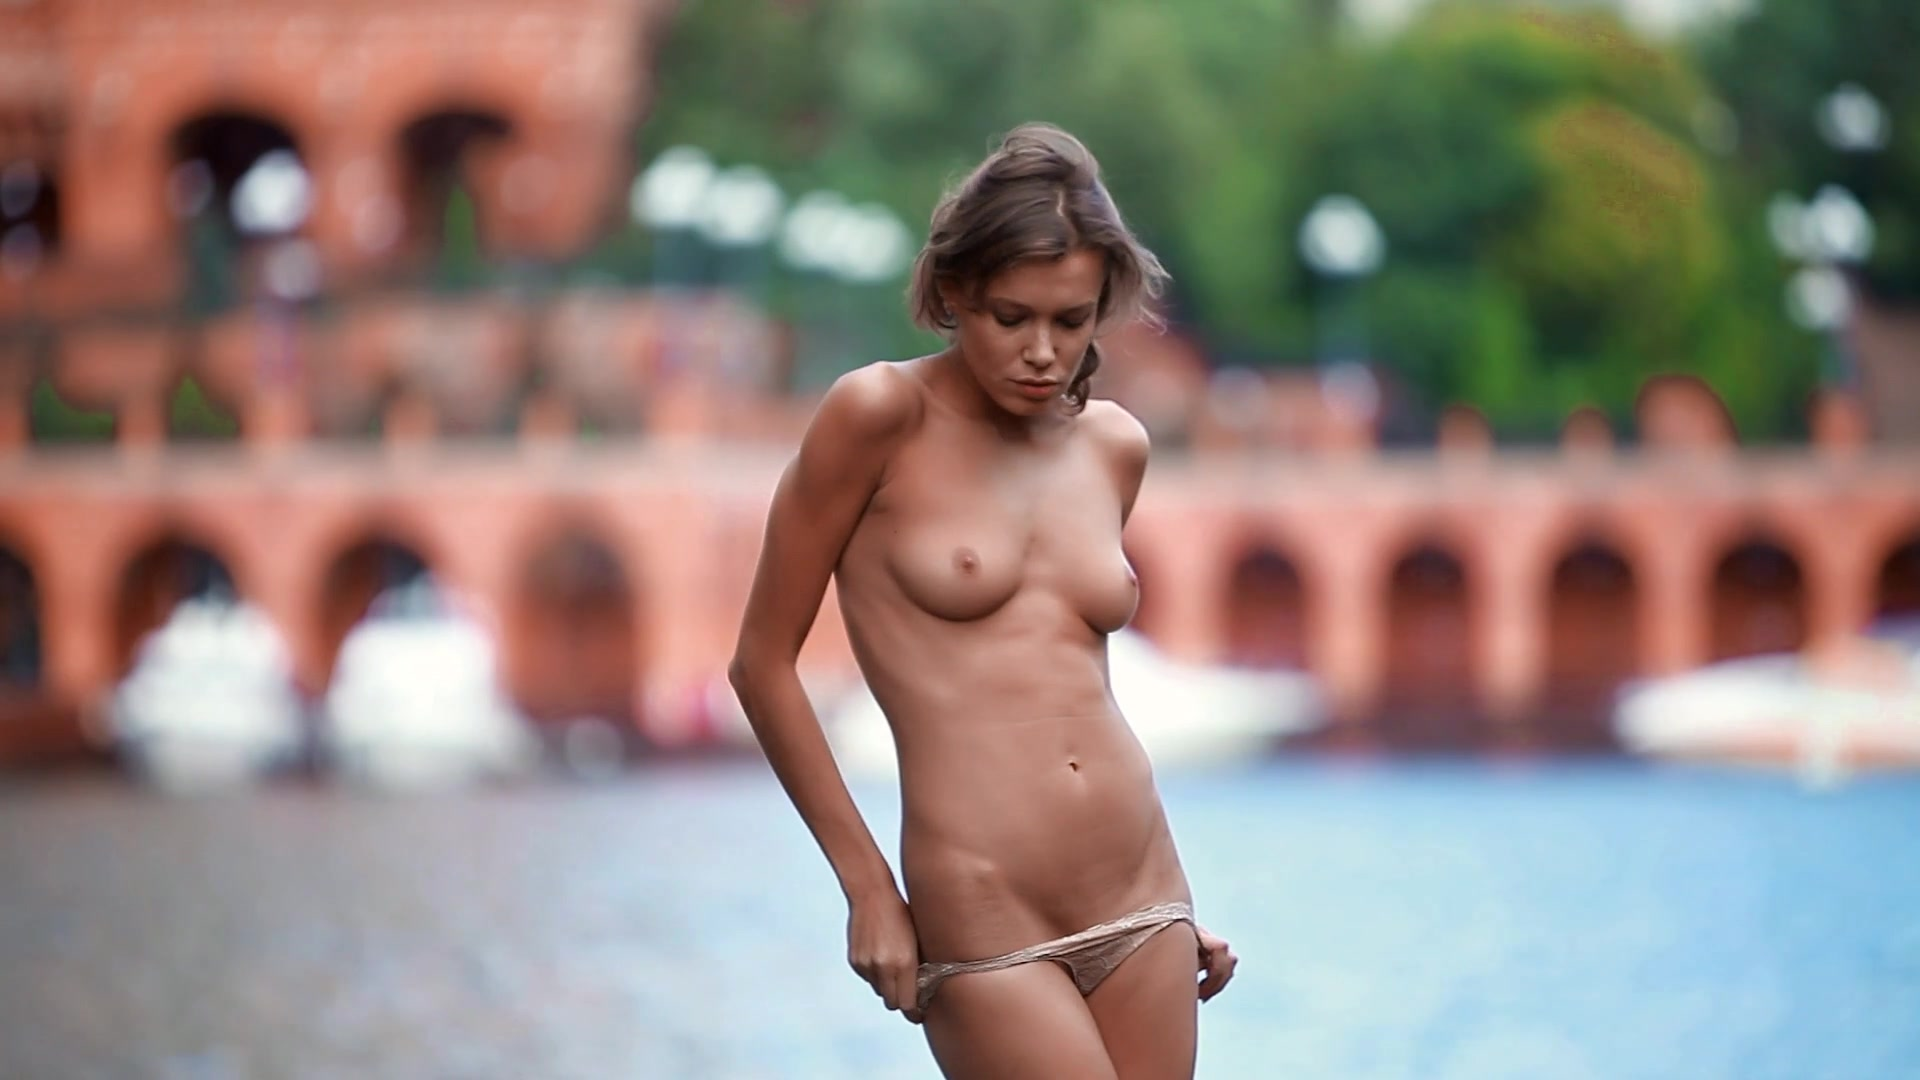 Erotik art nackt